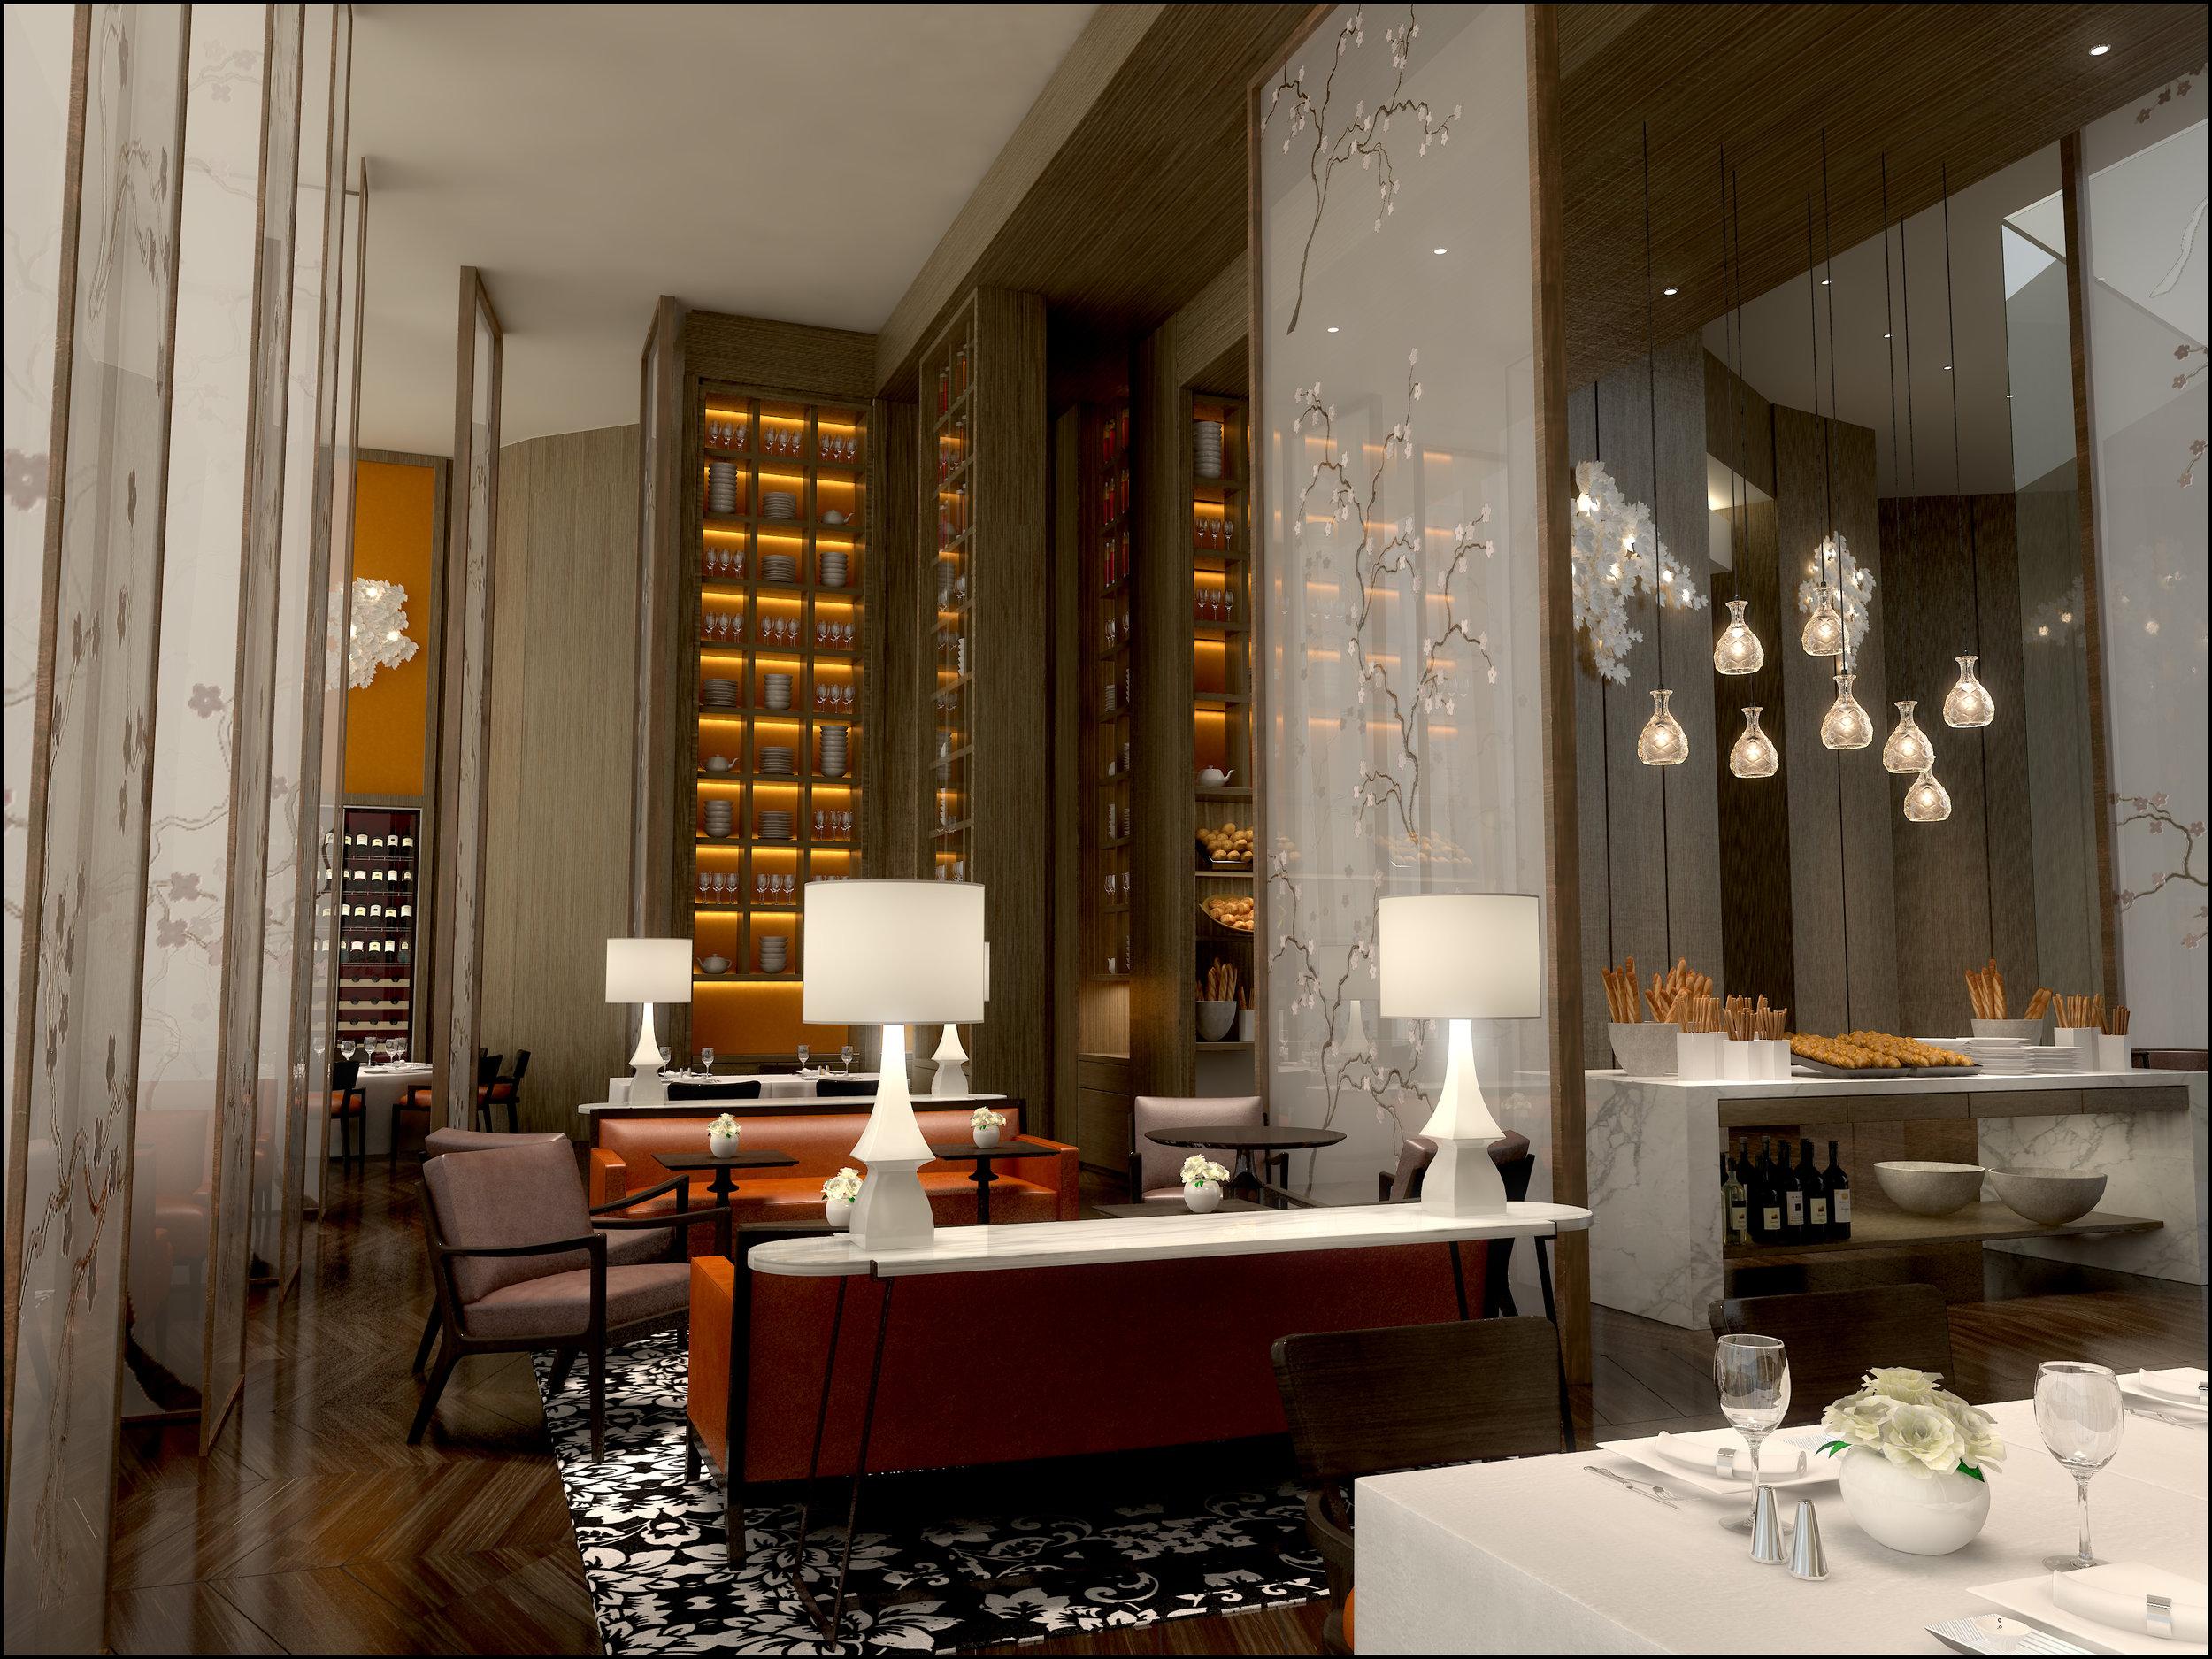 Park Hyatt Hotel Mumbai French Restaurant